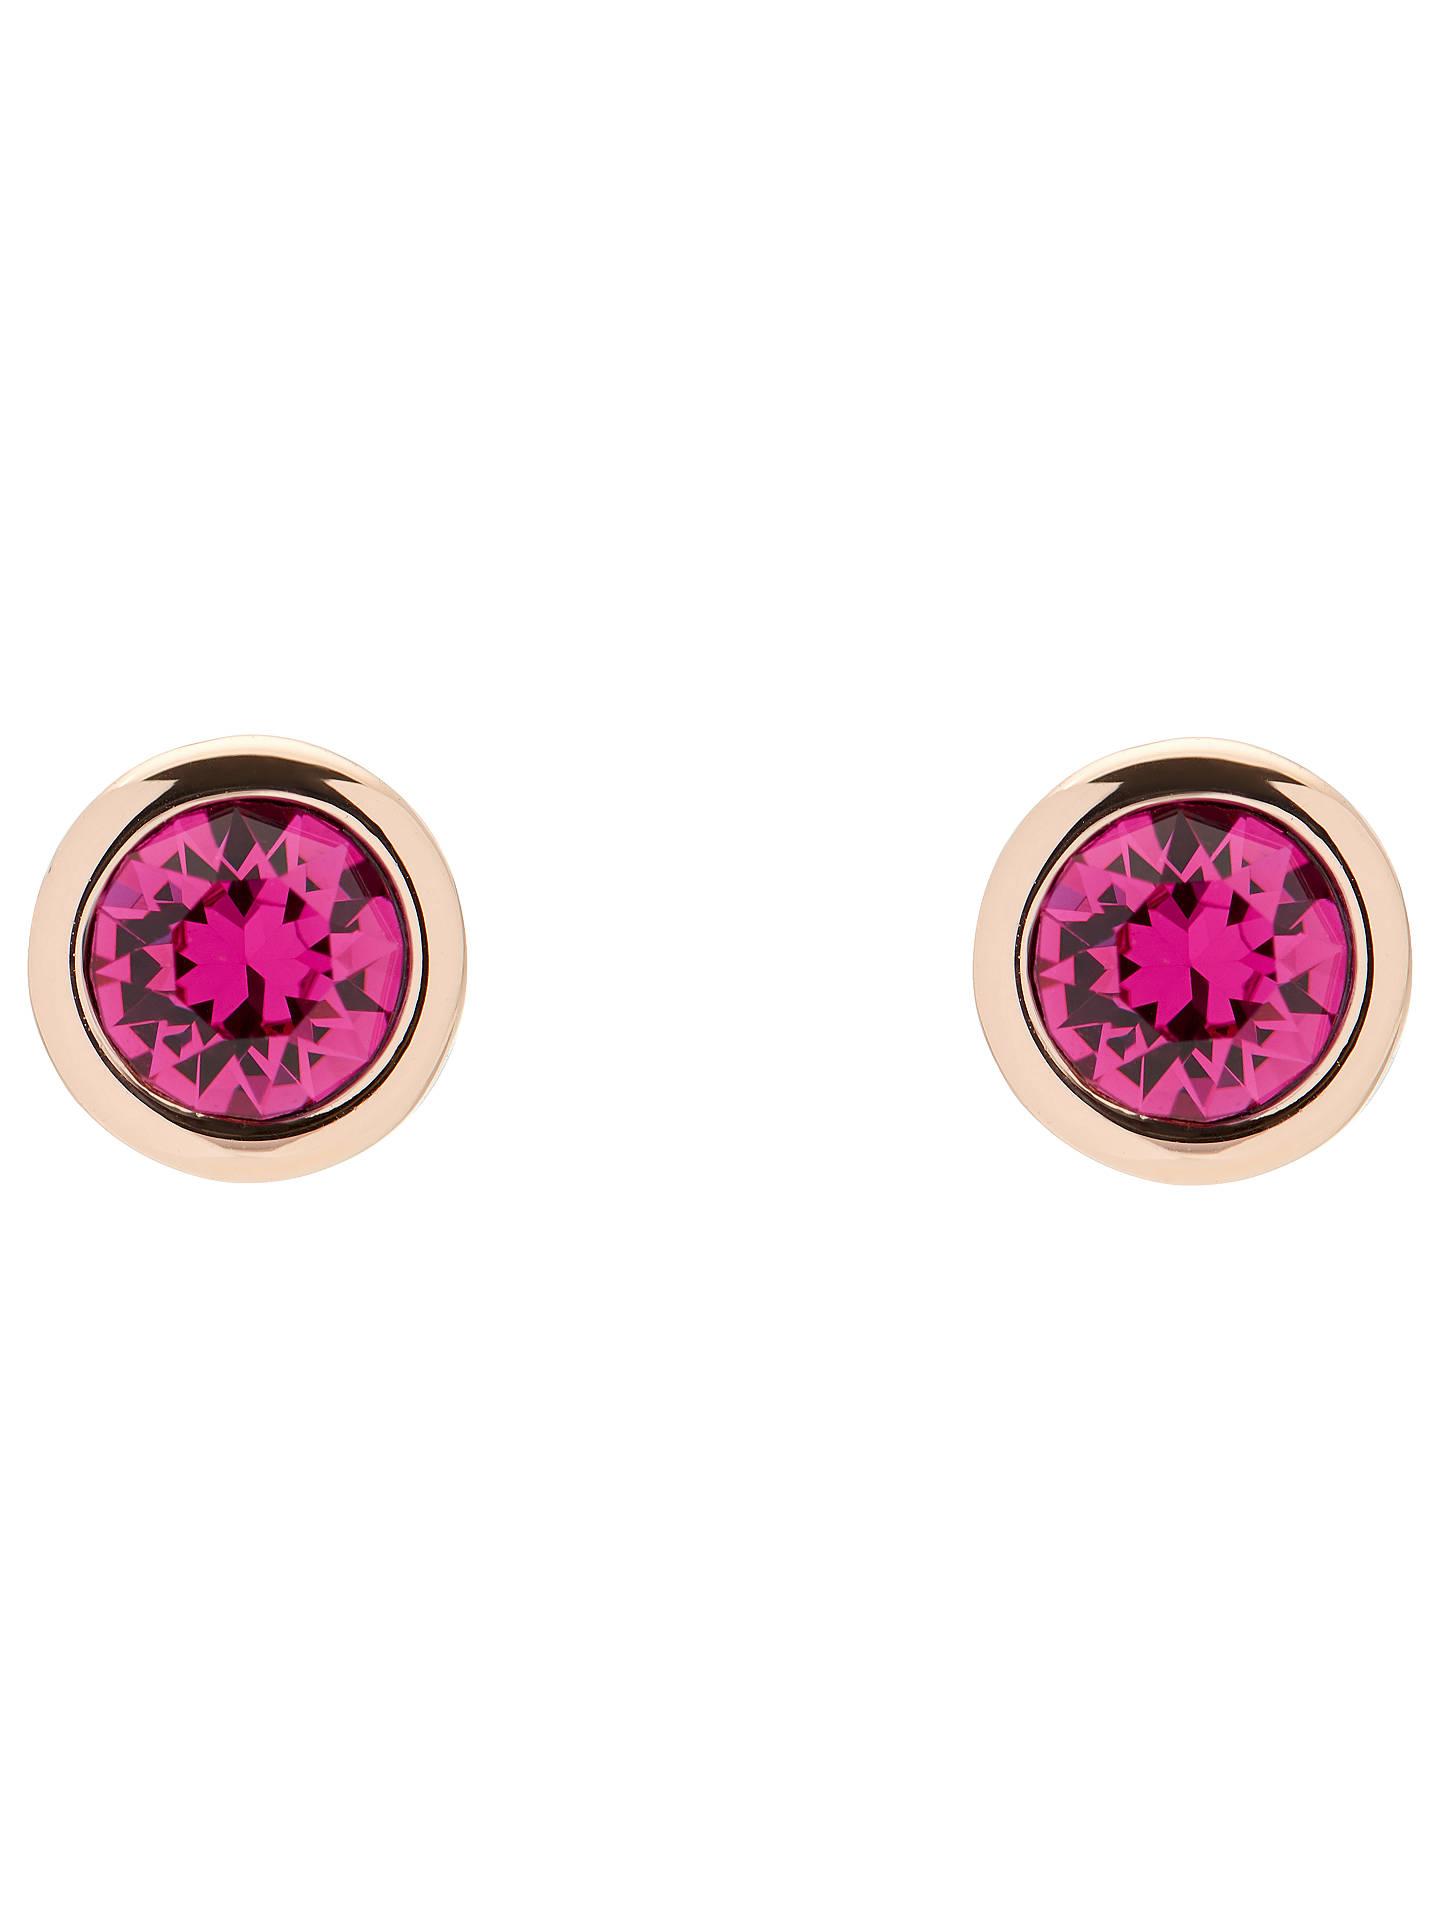 98fa00c4e Buy Ted Baker Sinaa Swarovski Crystal Stud Earrings, Rose Gold/Fuchsia  Online at johnlewis